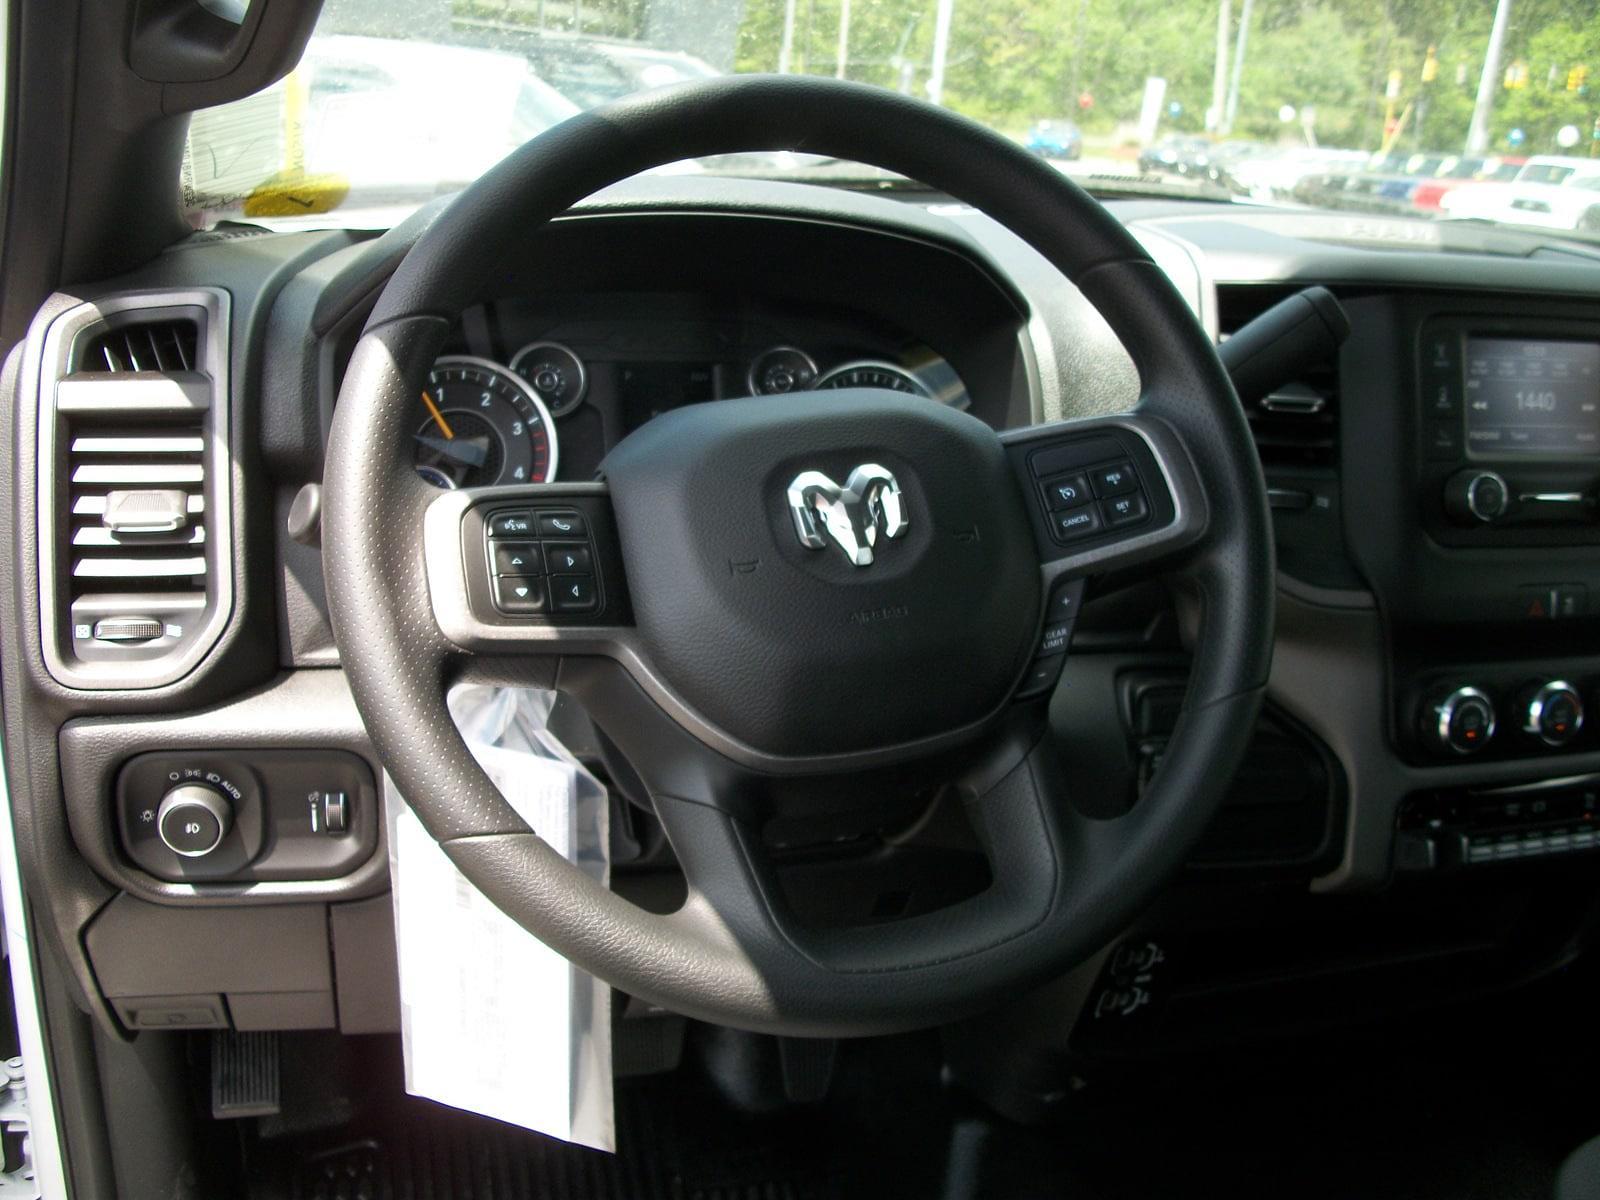 2021 Ram 5500 Regular Cab DRW 4x4,  Cab Chassis #21590 - photo 11